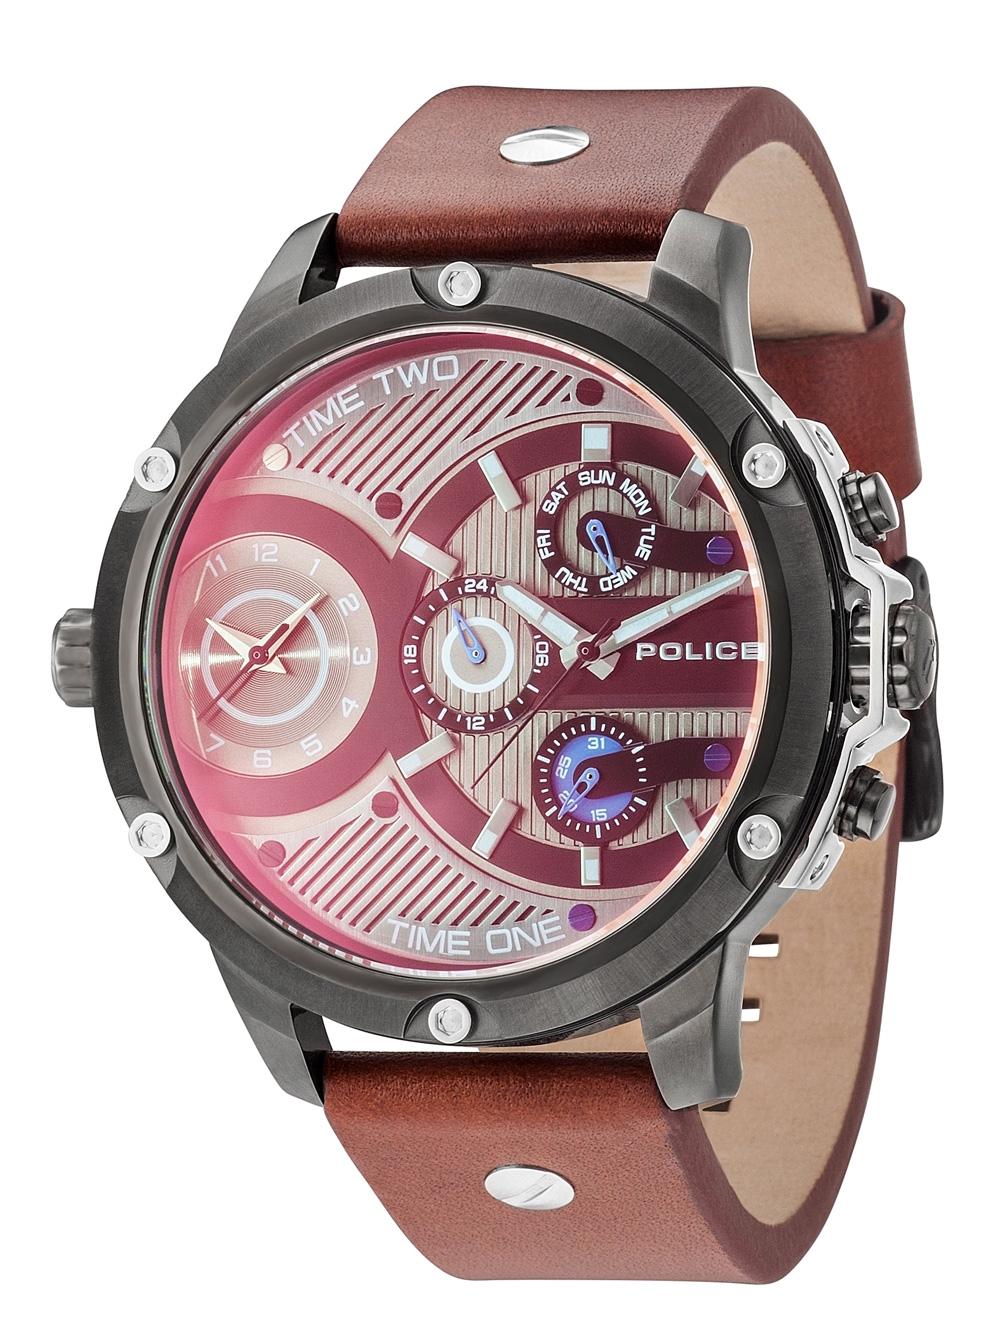 Police Armbanduhren im Outlet kaufen – Armbanduhrenhaus 391017cbca